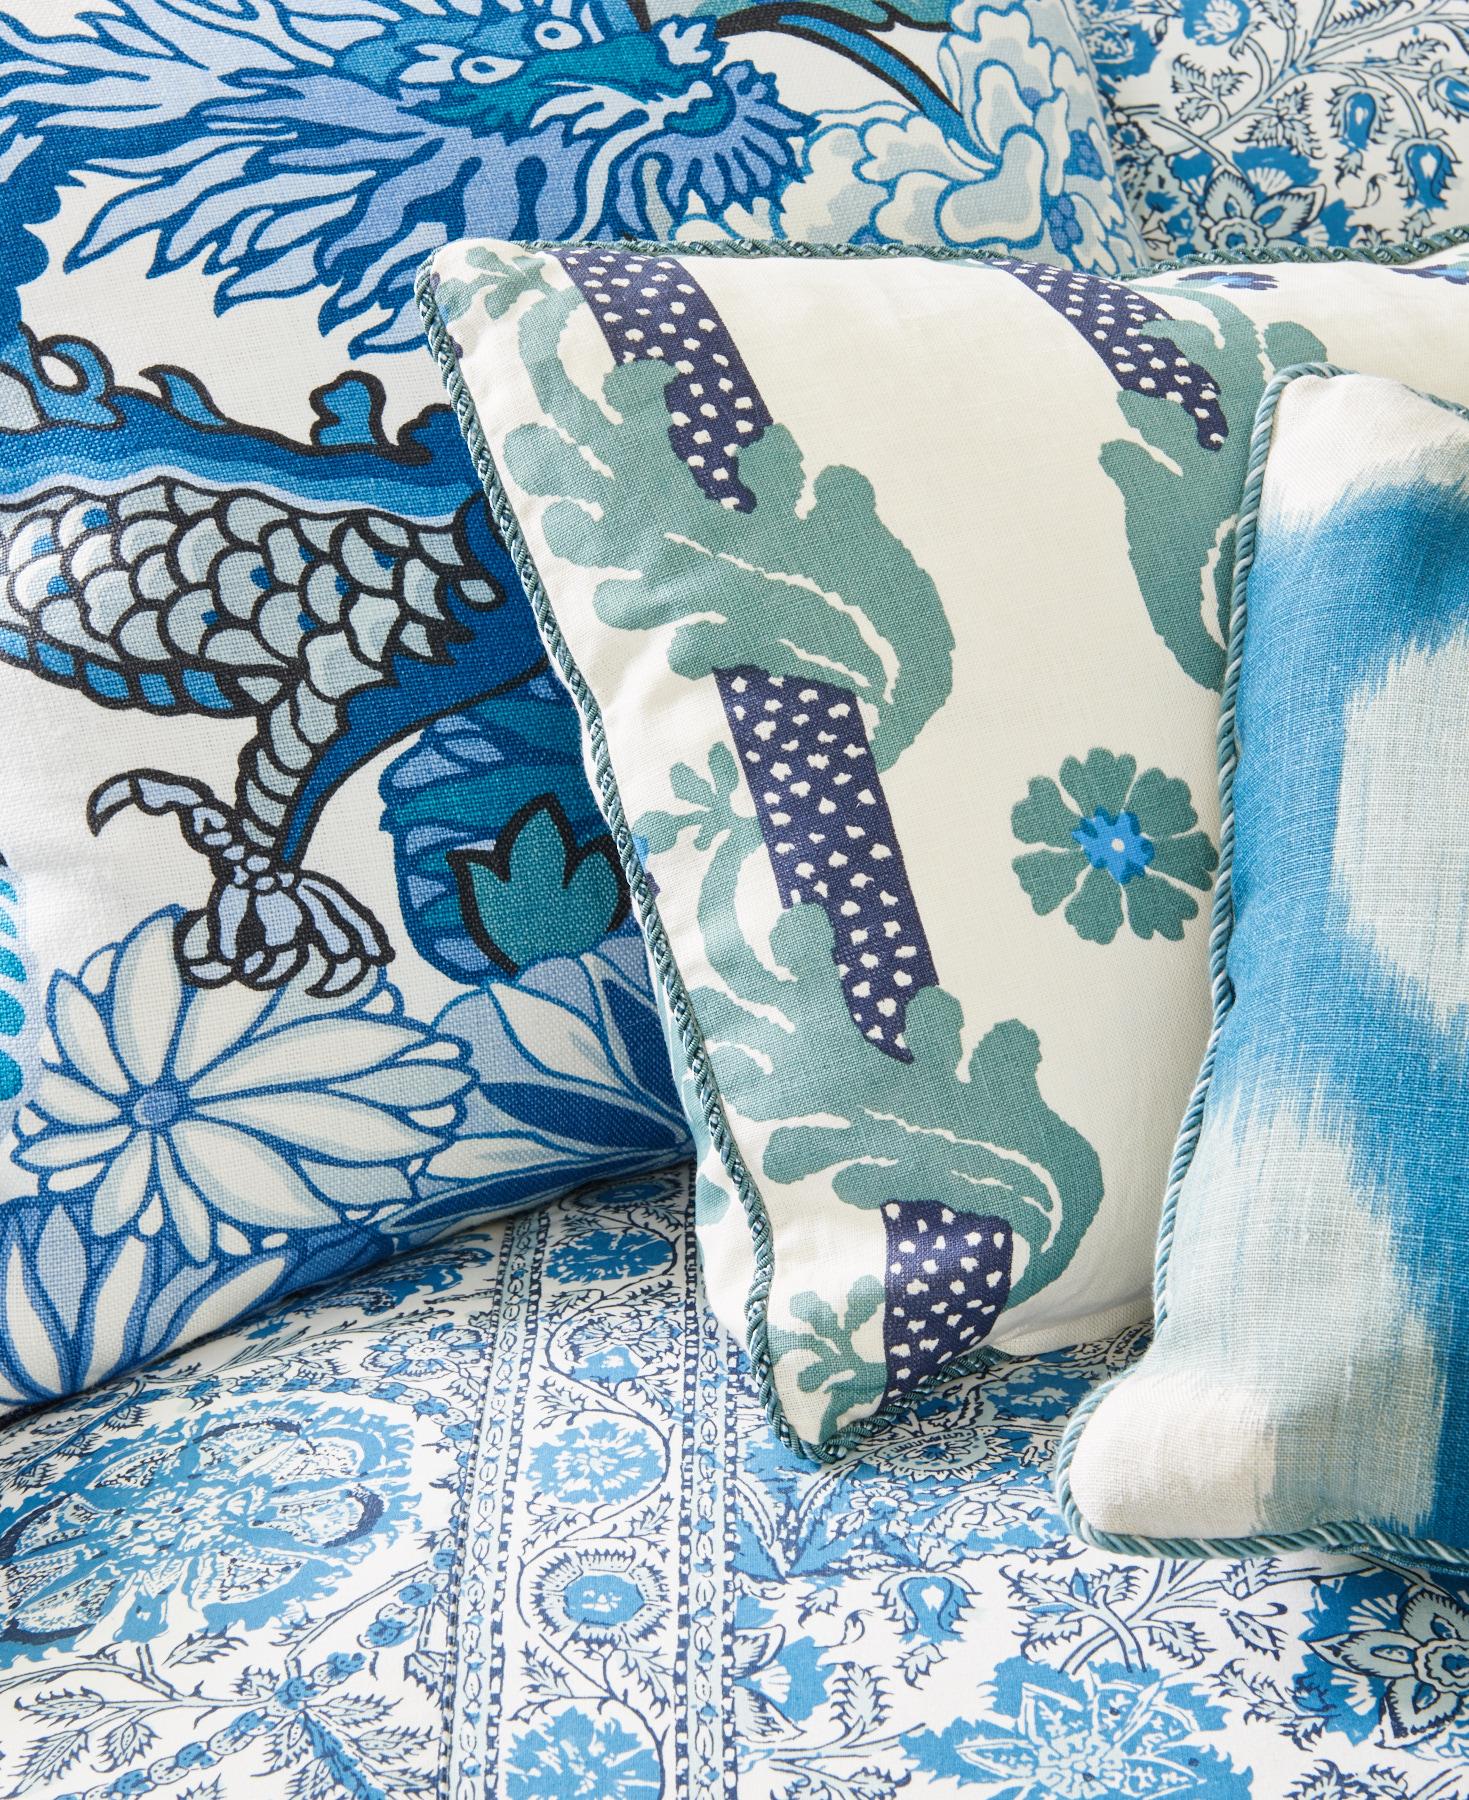 Various blue textiles